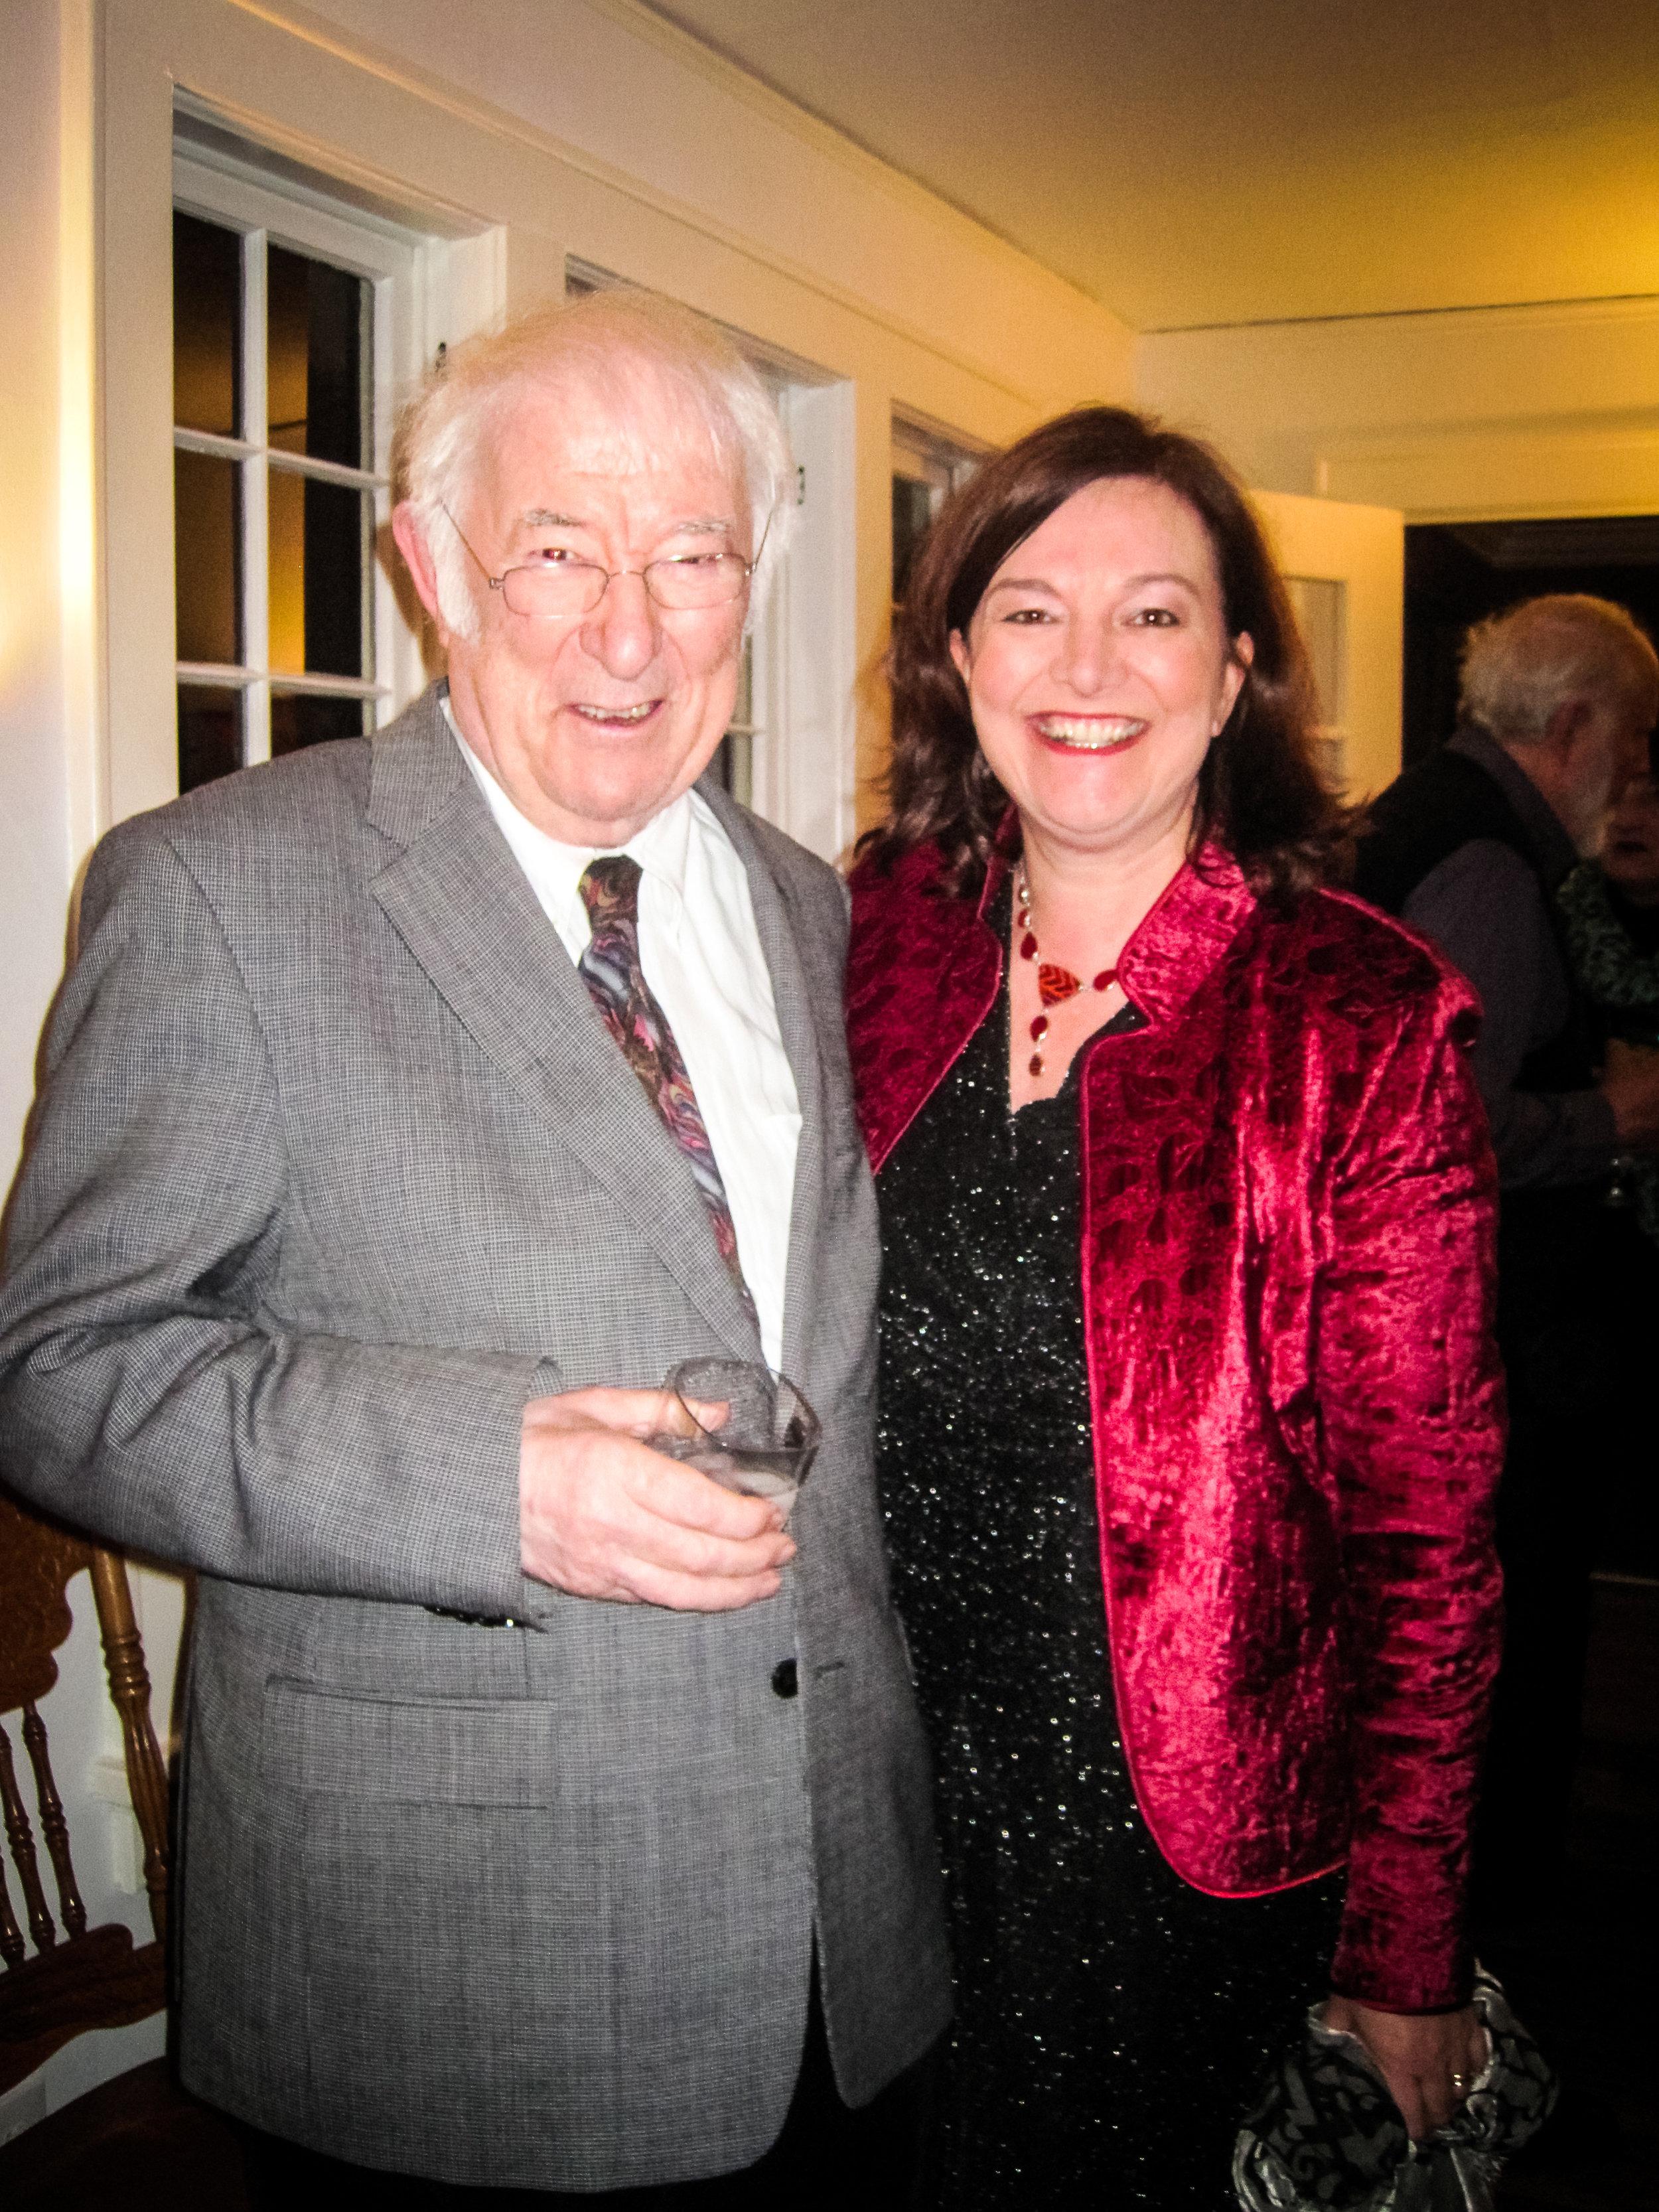 Seamus Heaney and Geraldine Higgins in Atlanta, 2013.